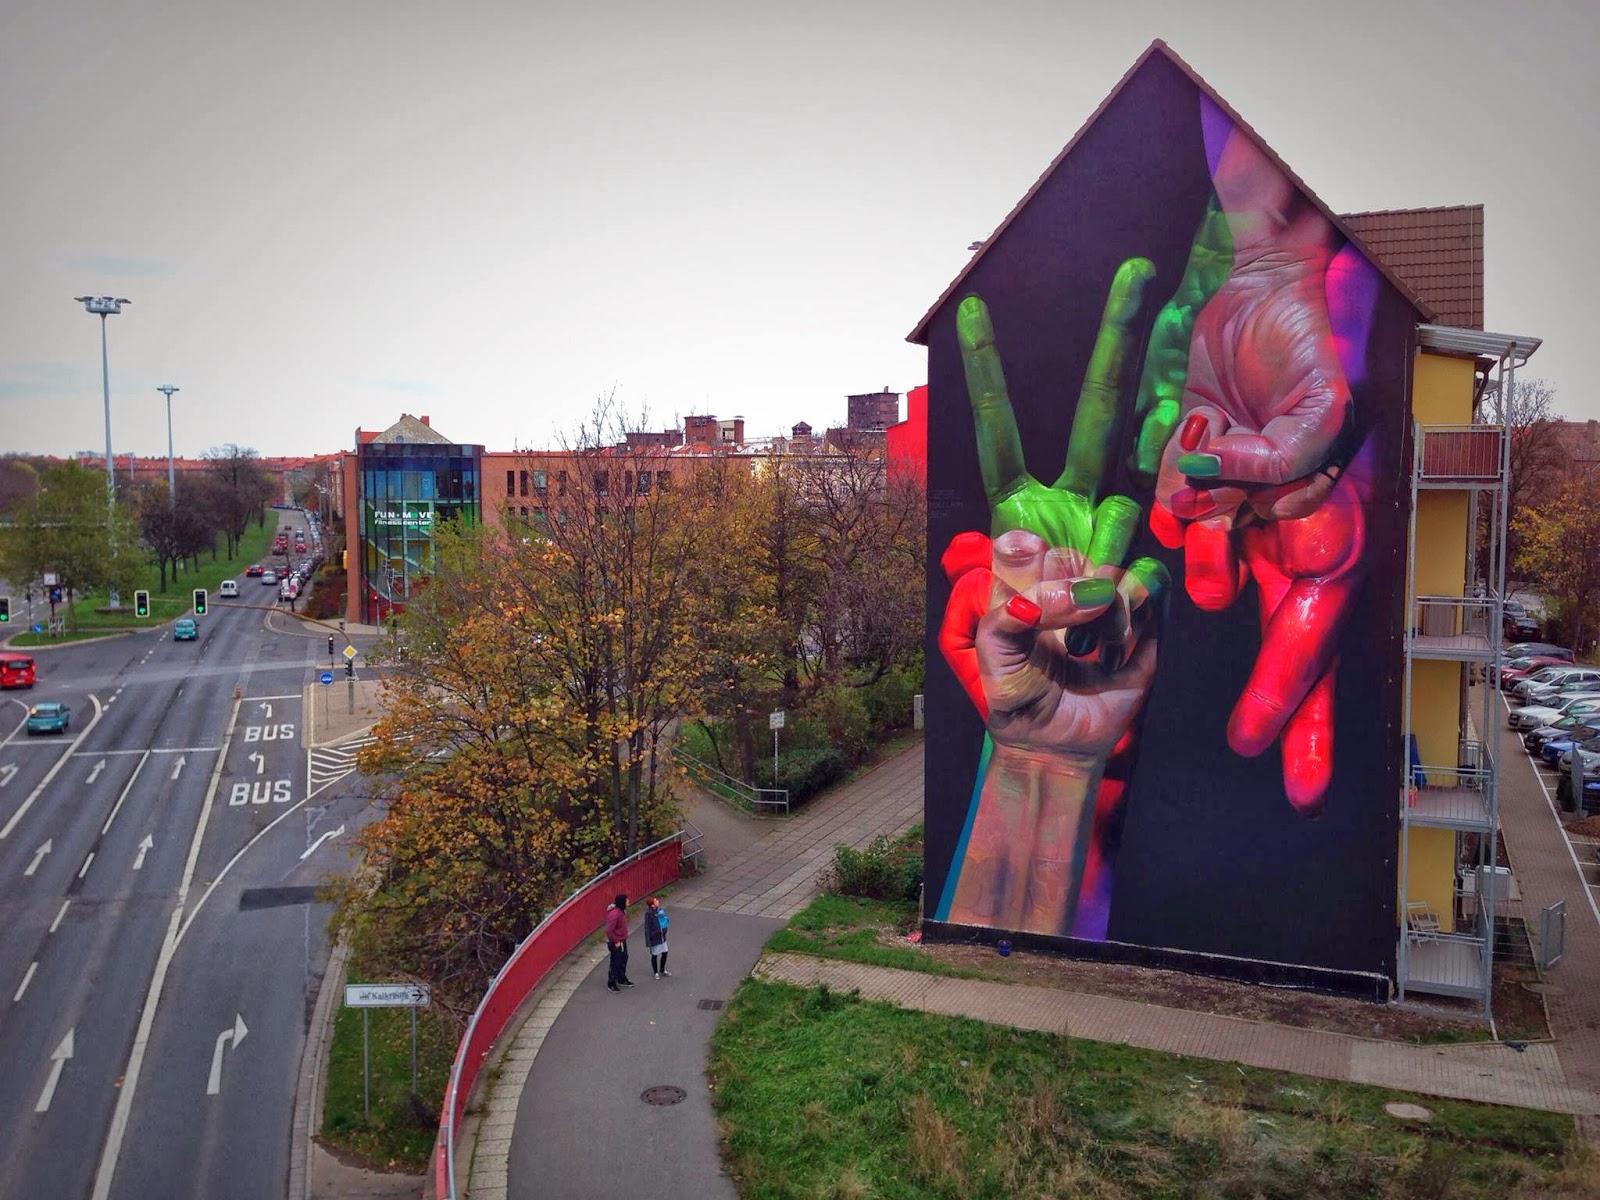 case-new-mural-oq-paint-erfurt-germany-01